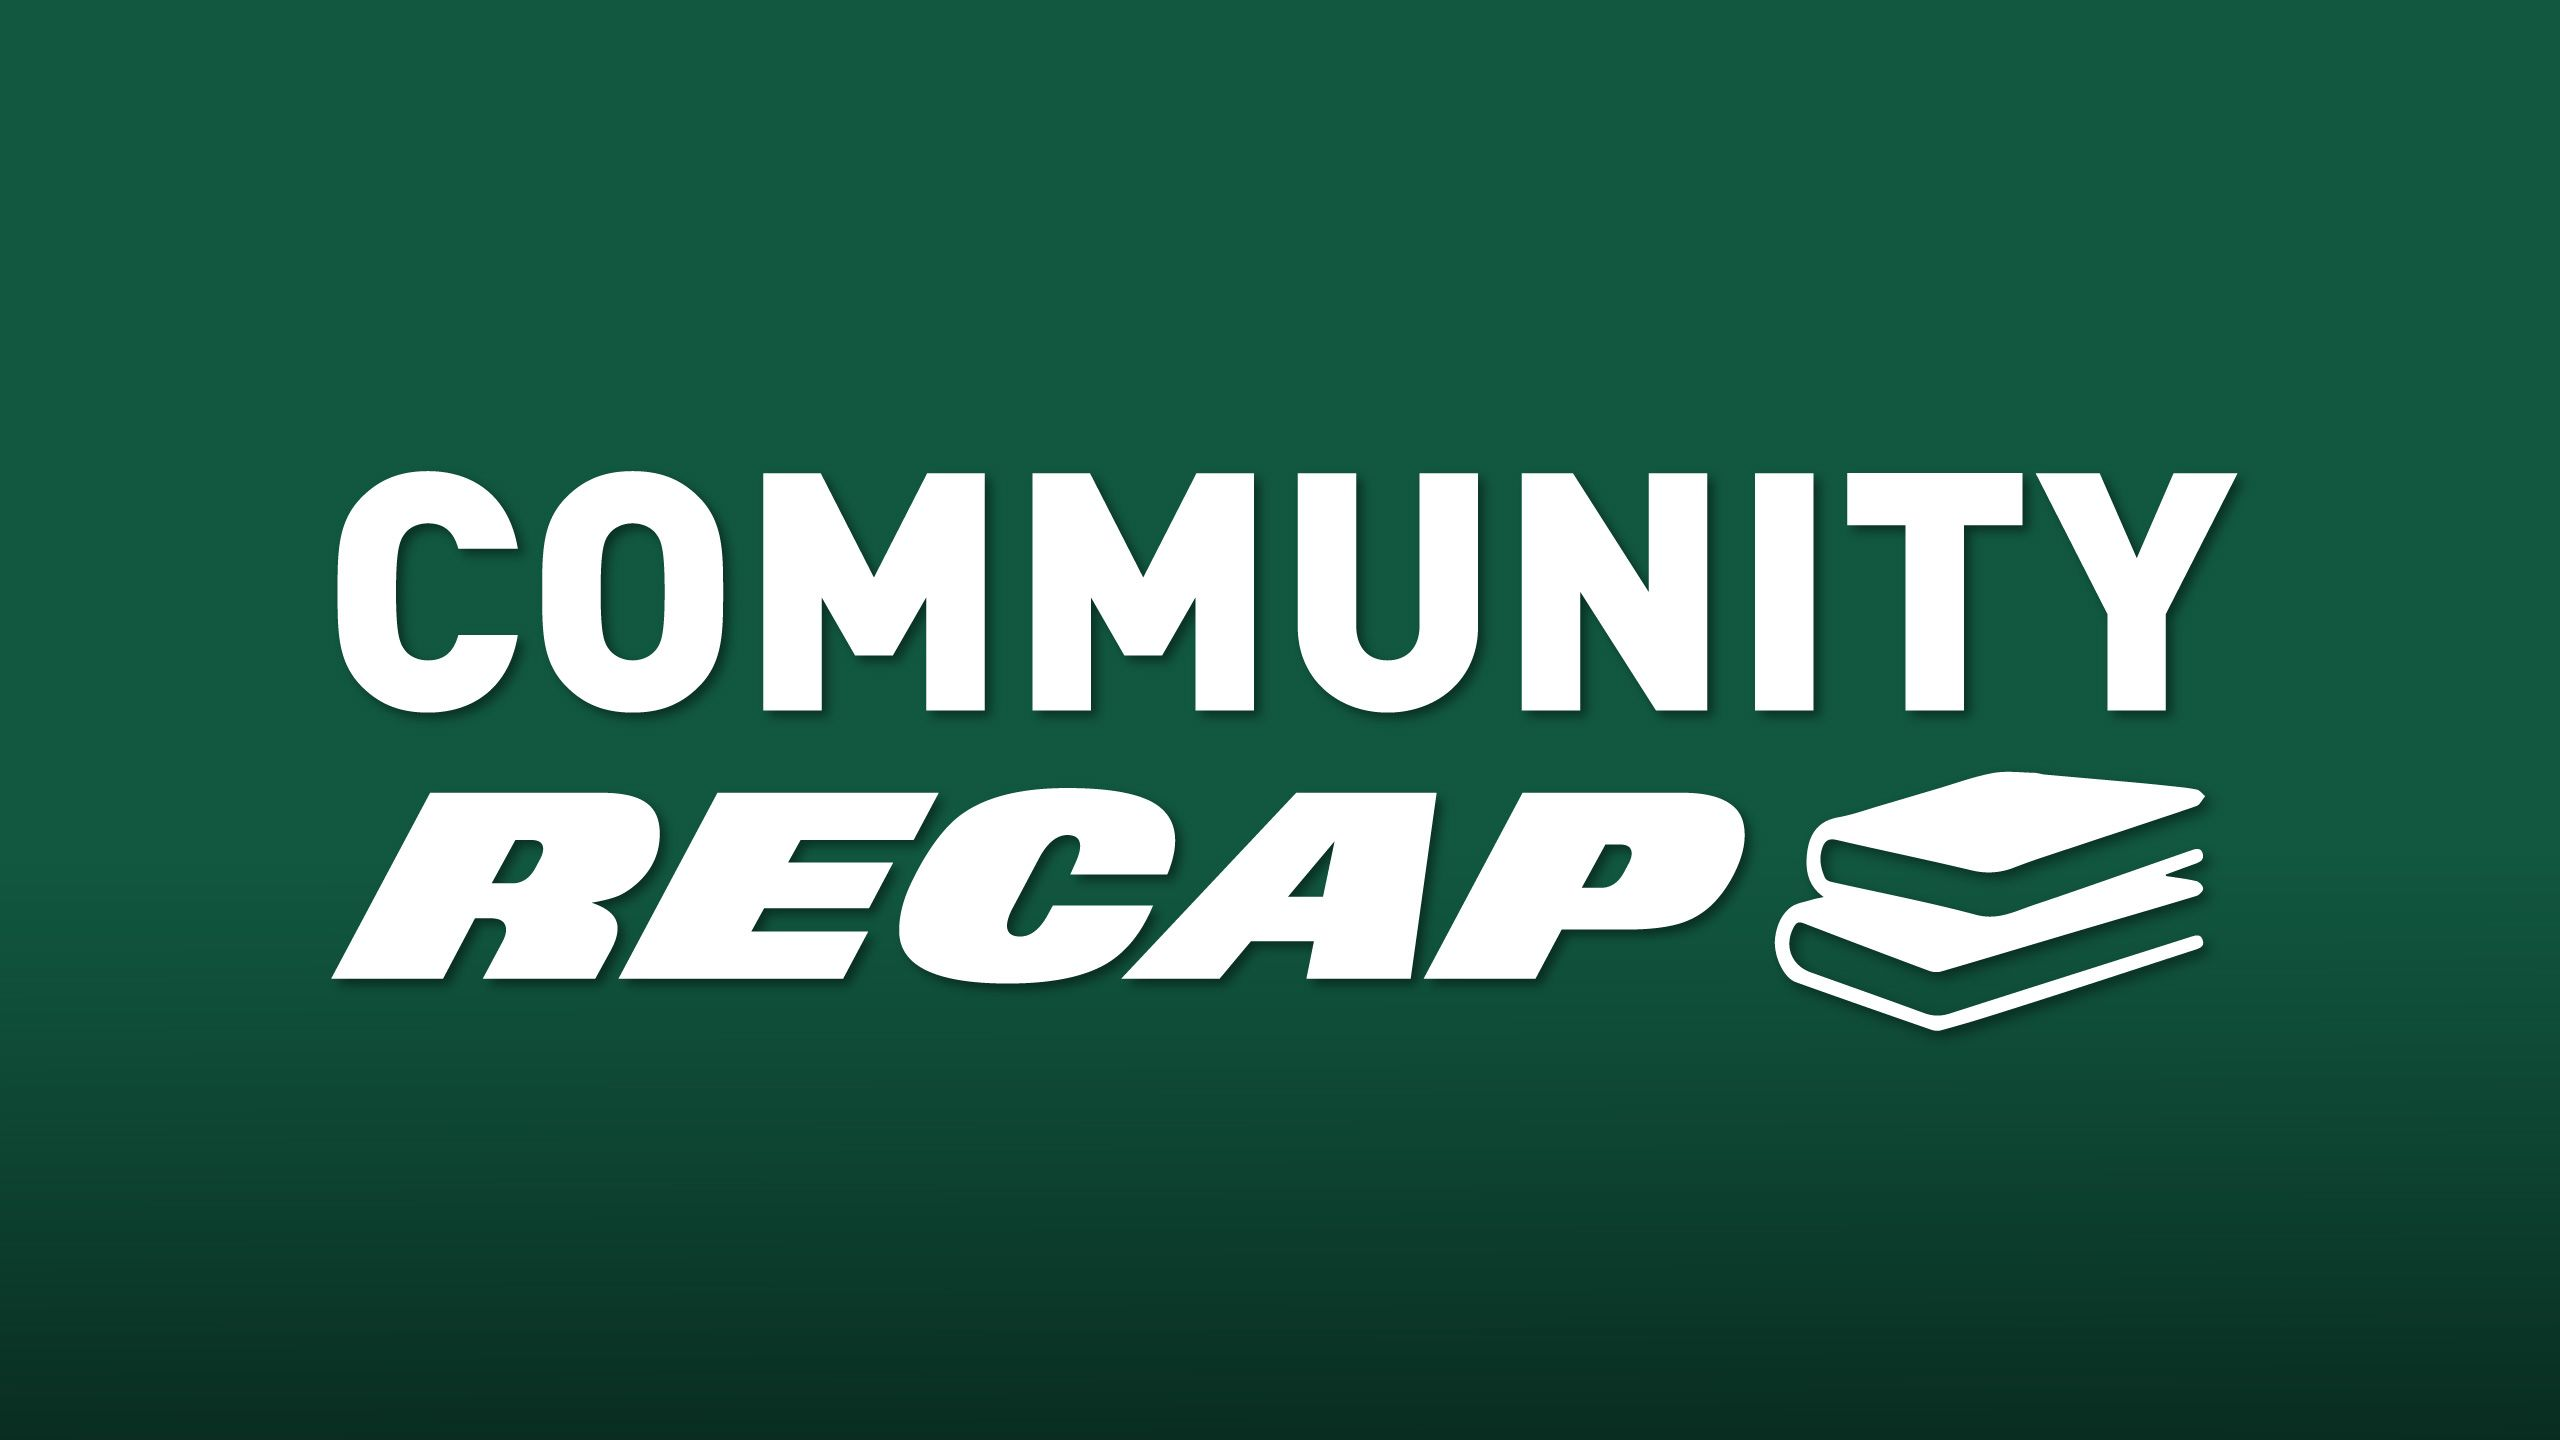 community-recap-slate